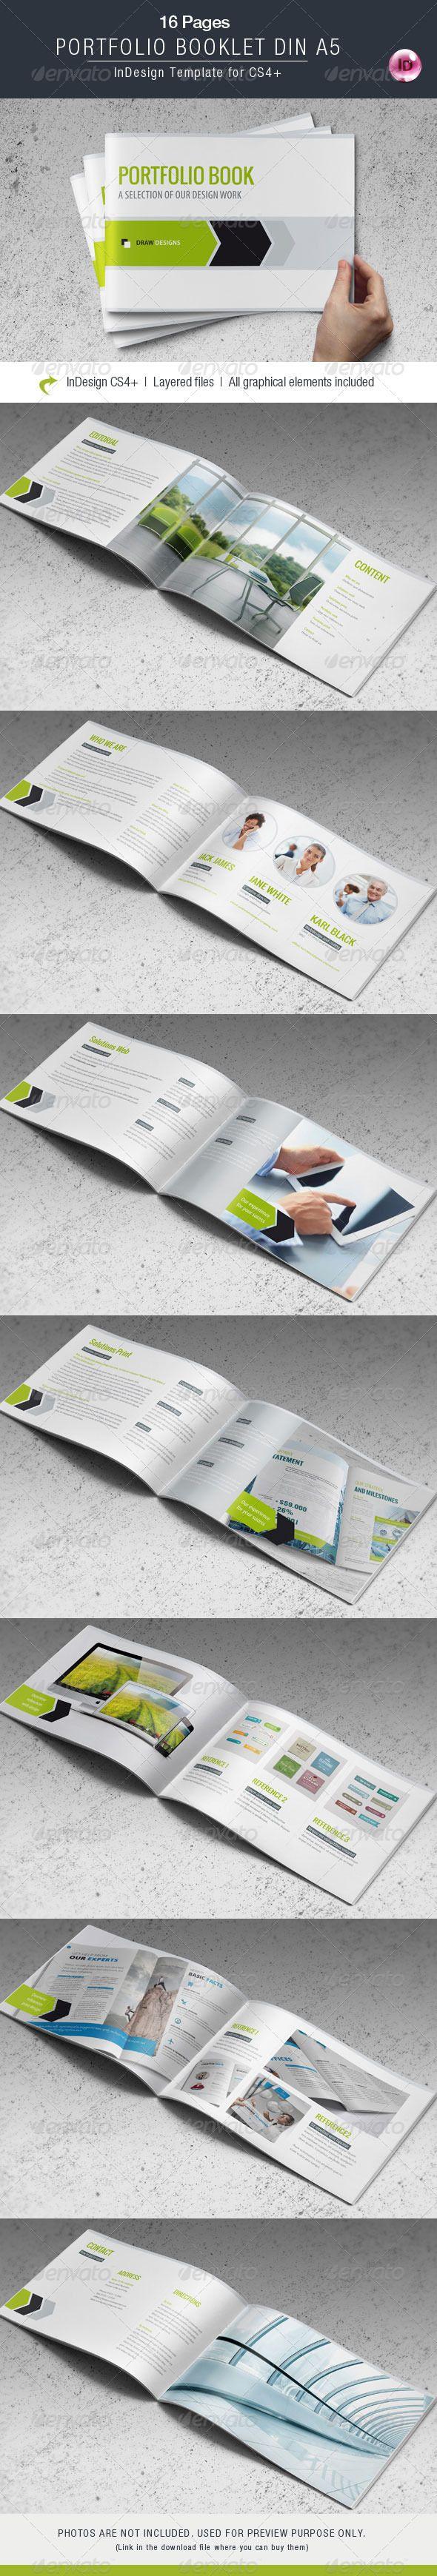 Portfolio Booklet DIN A5 by corrella2 Portfolio Booklet DIN A5 ...